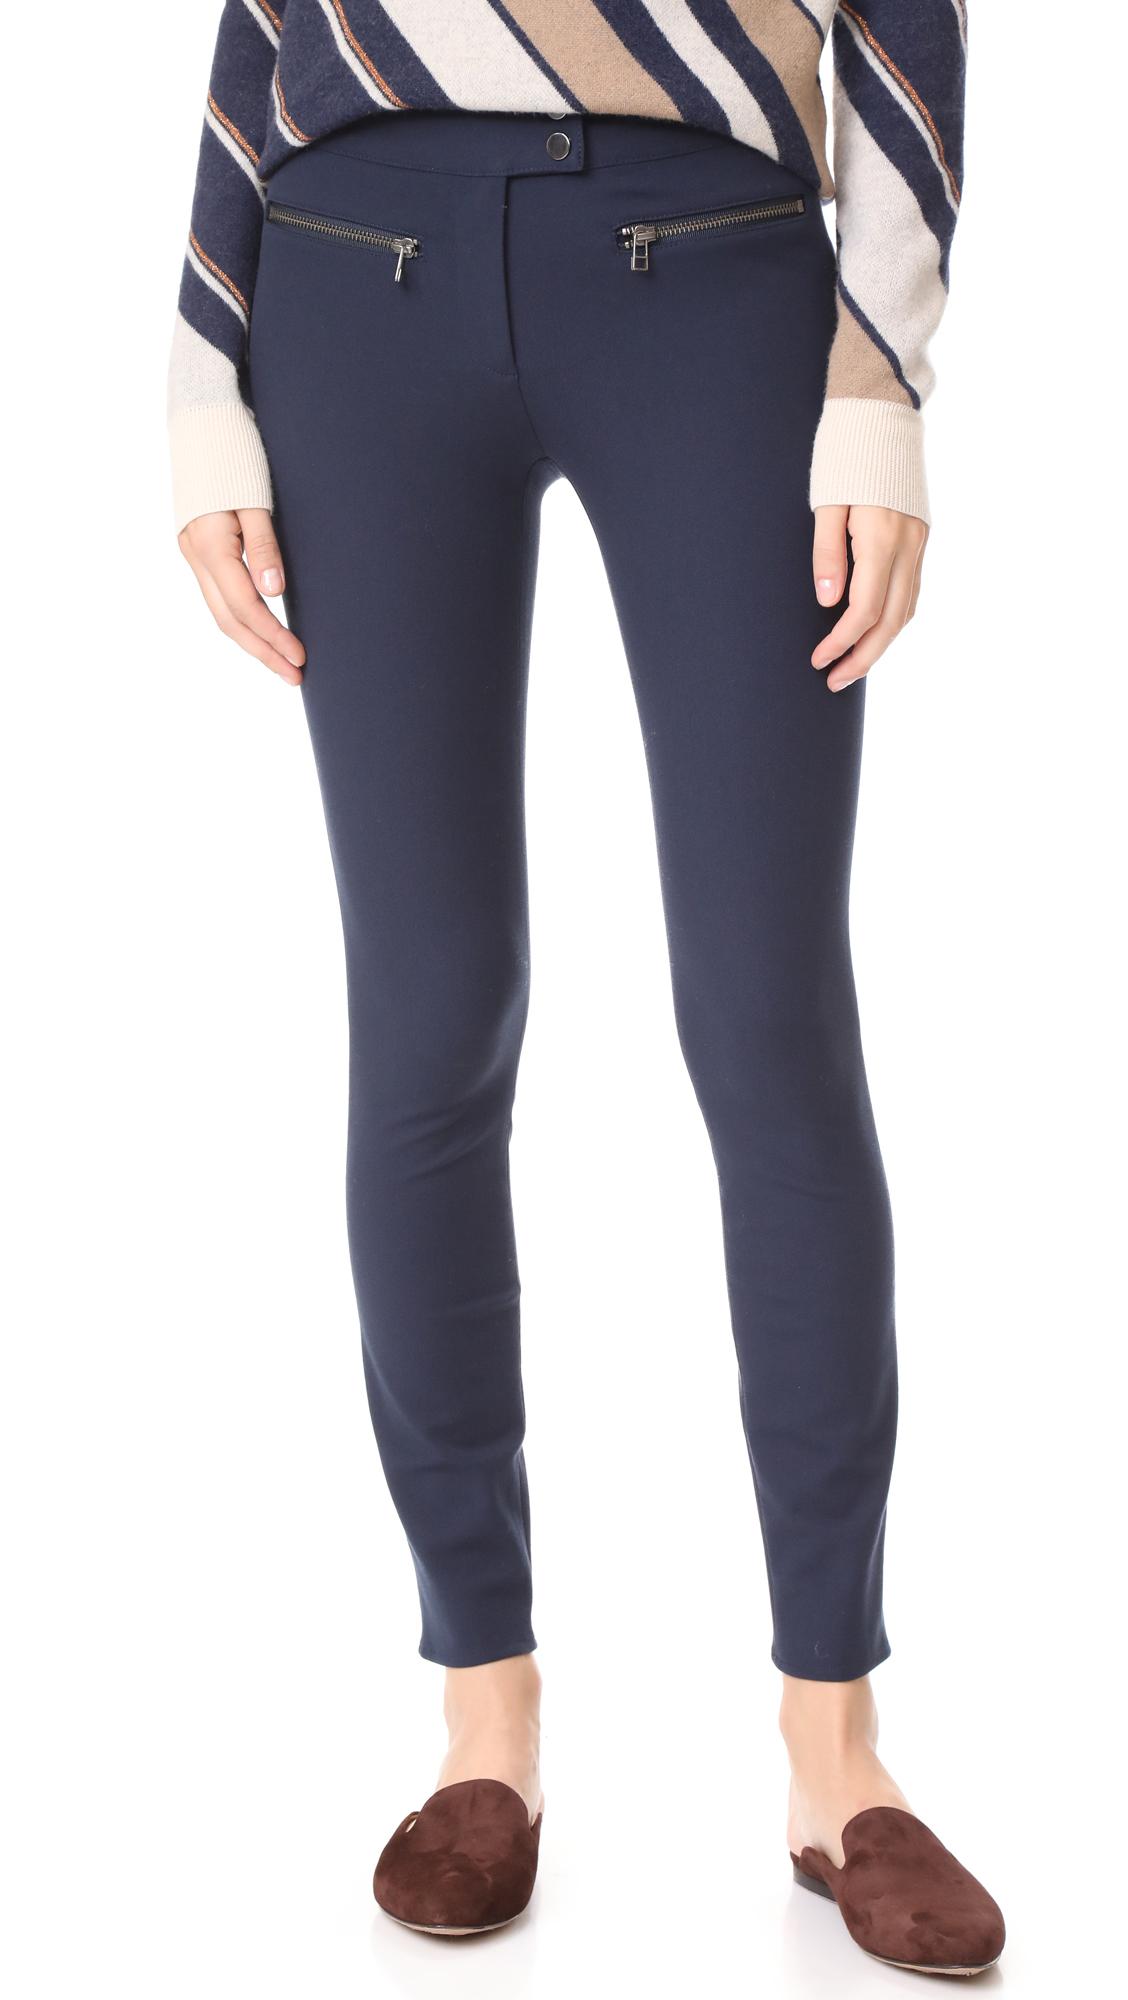 Veronica Beard Full Length Skinny Pants - Navy